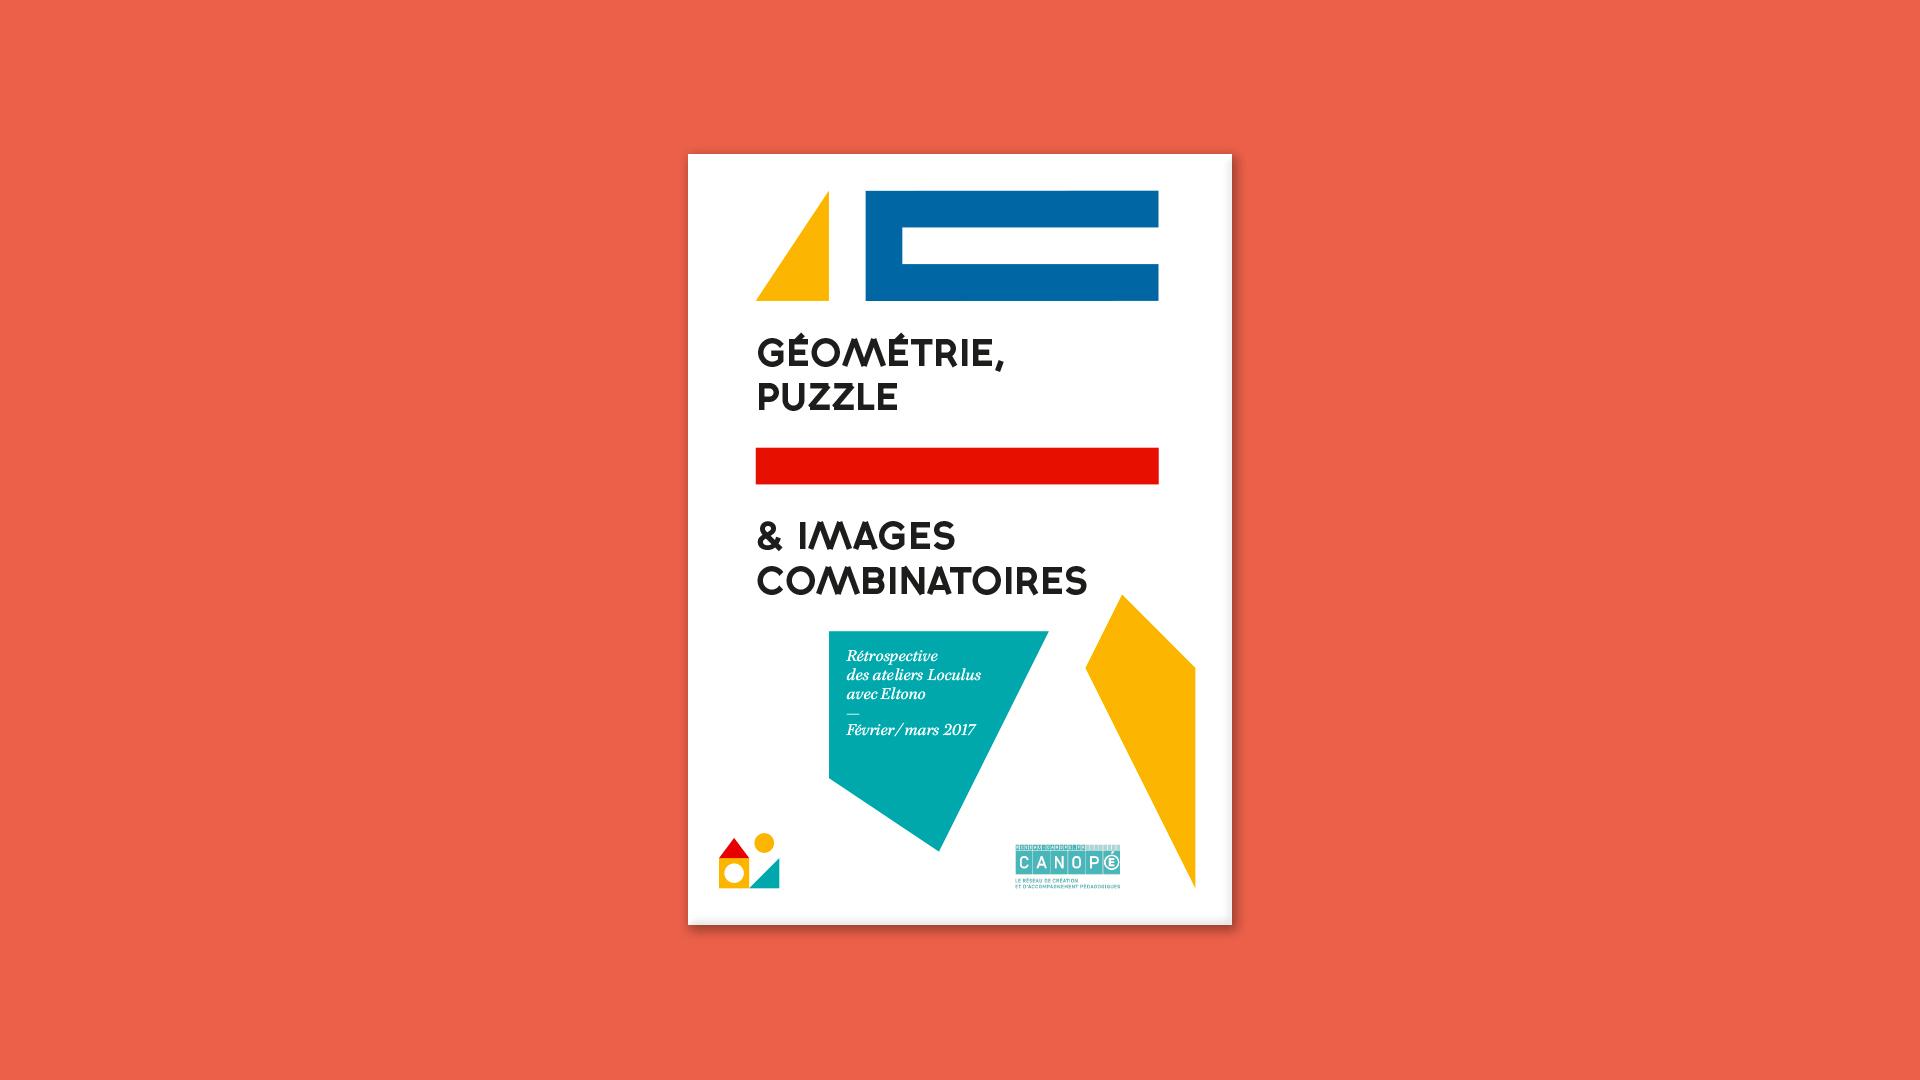 GeometriePuzzle_Eltono_03